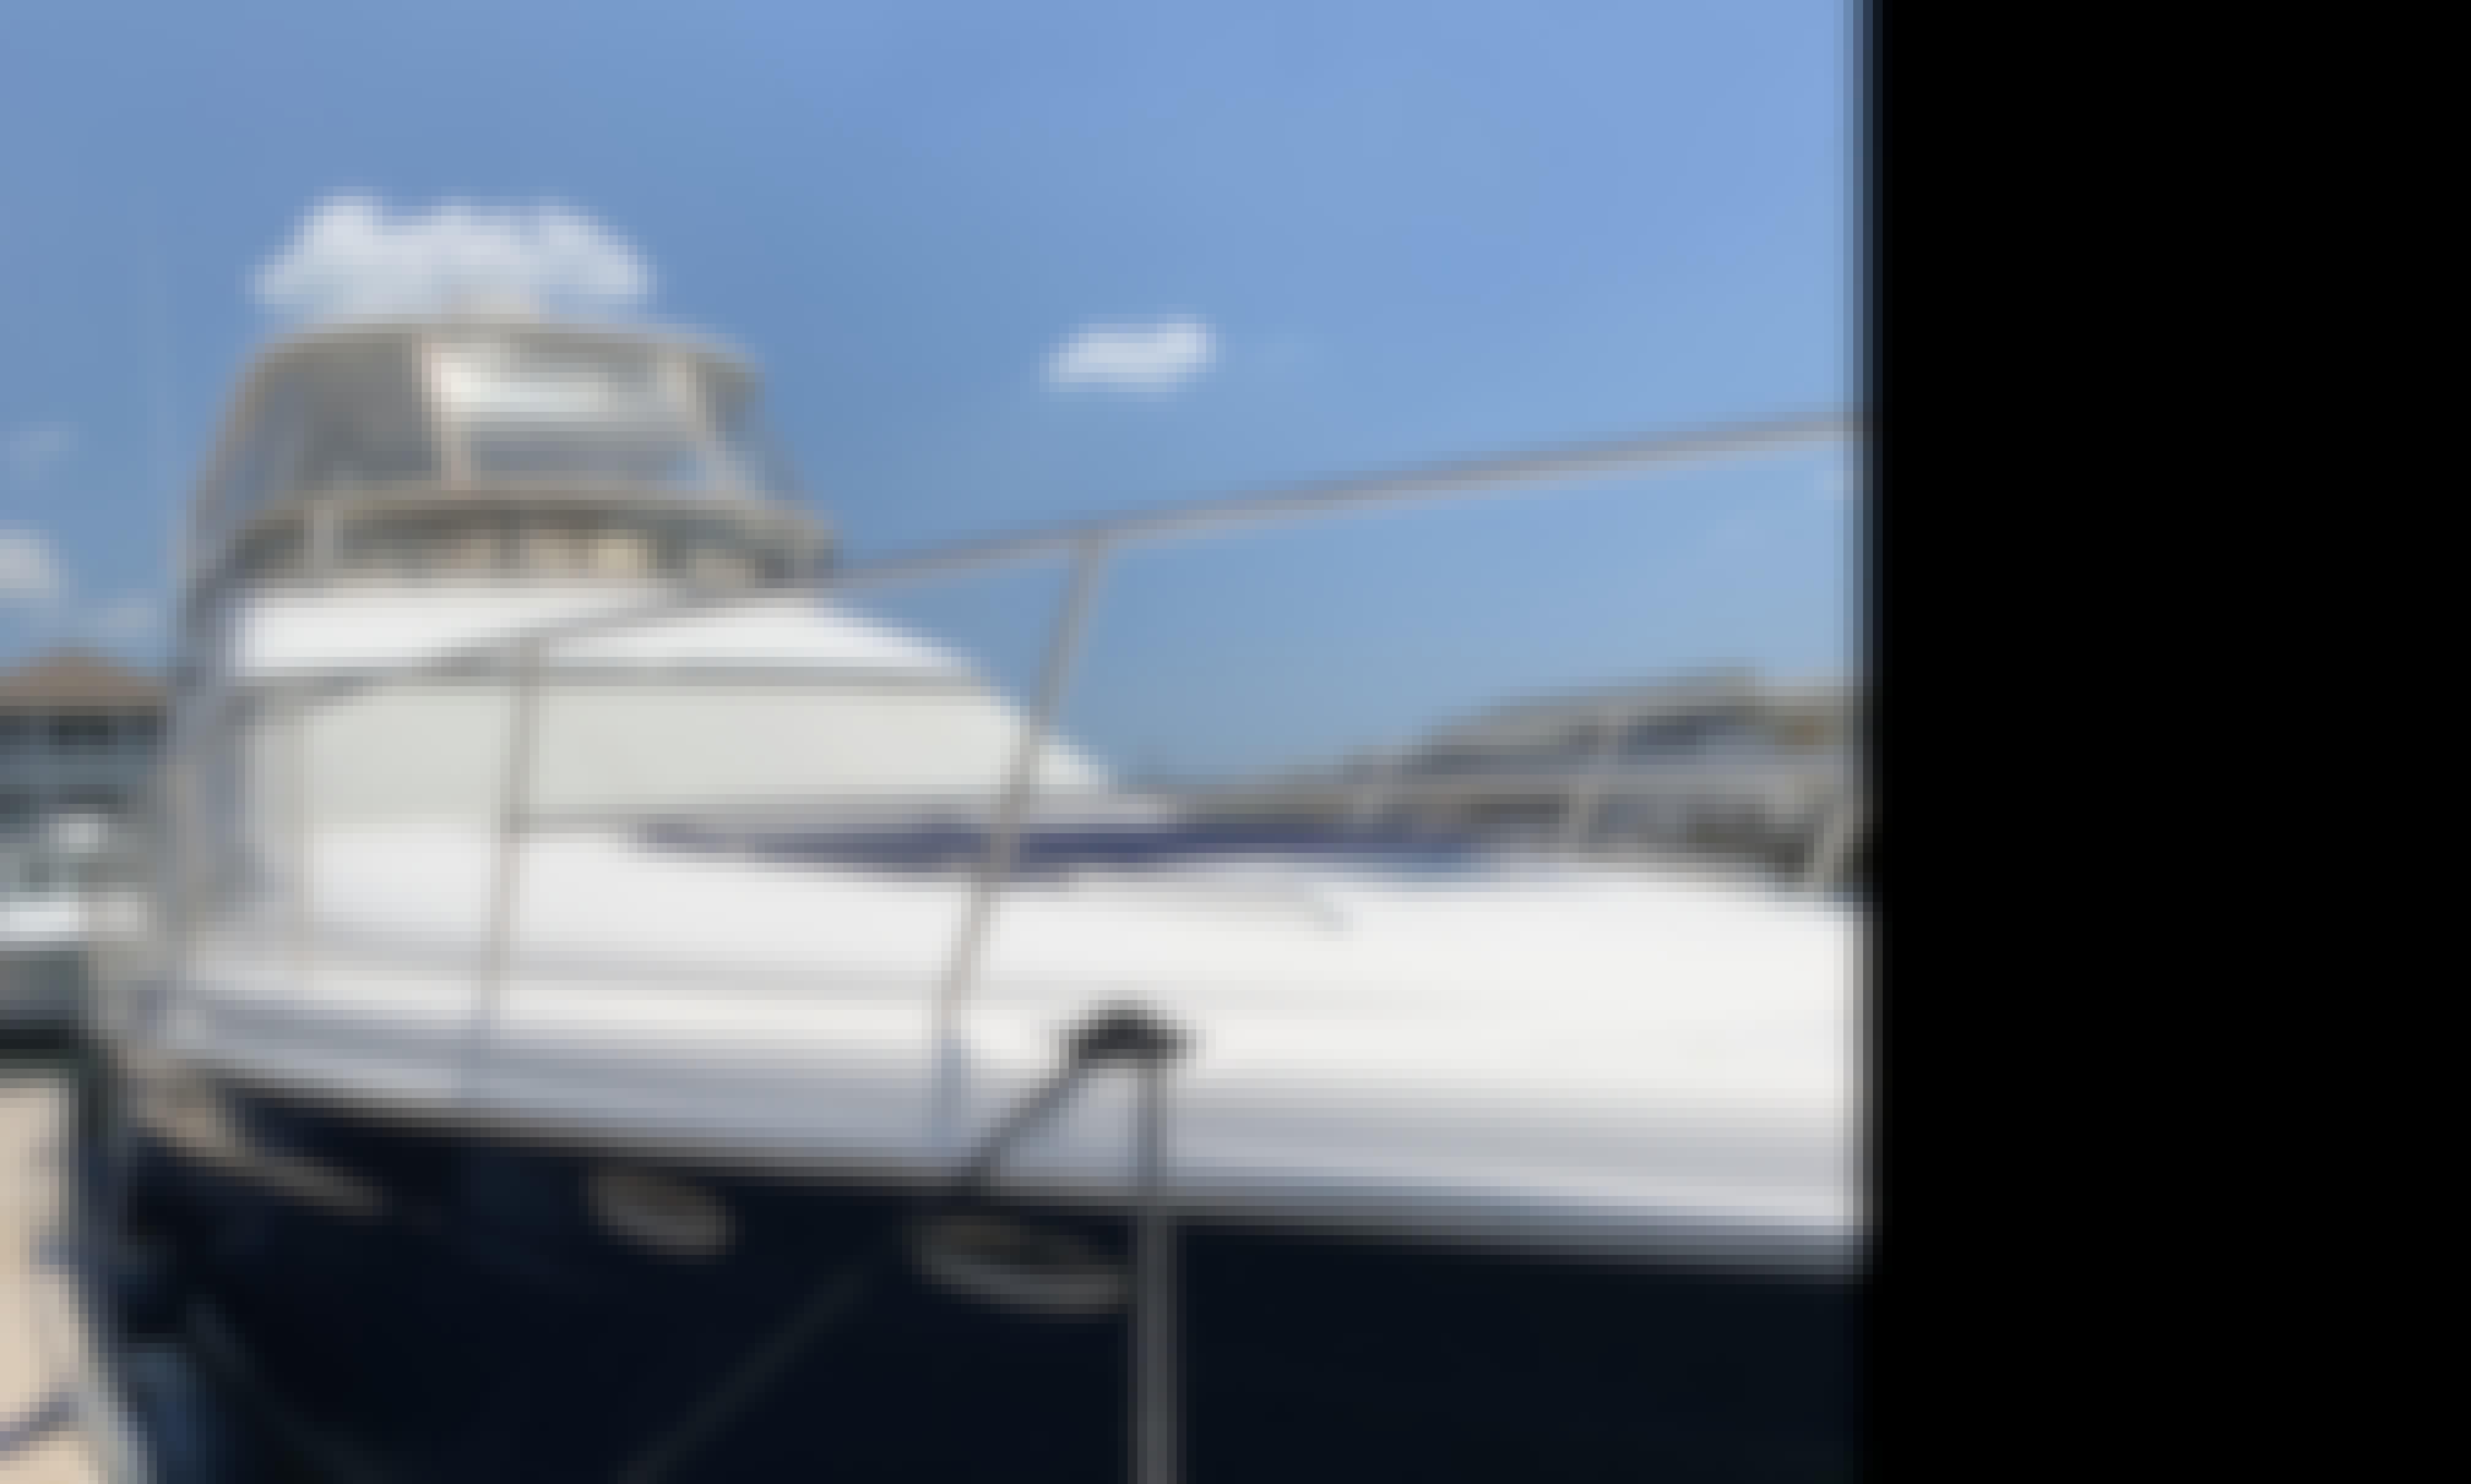 56' SeaRay Sedan Bridge Power Yacht Rental in Wrightsville Beach, NC